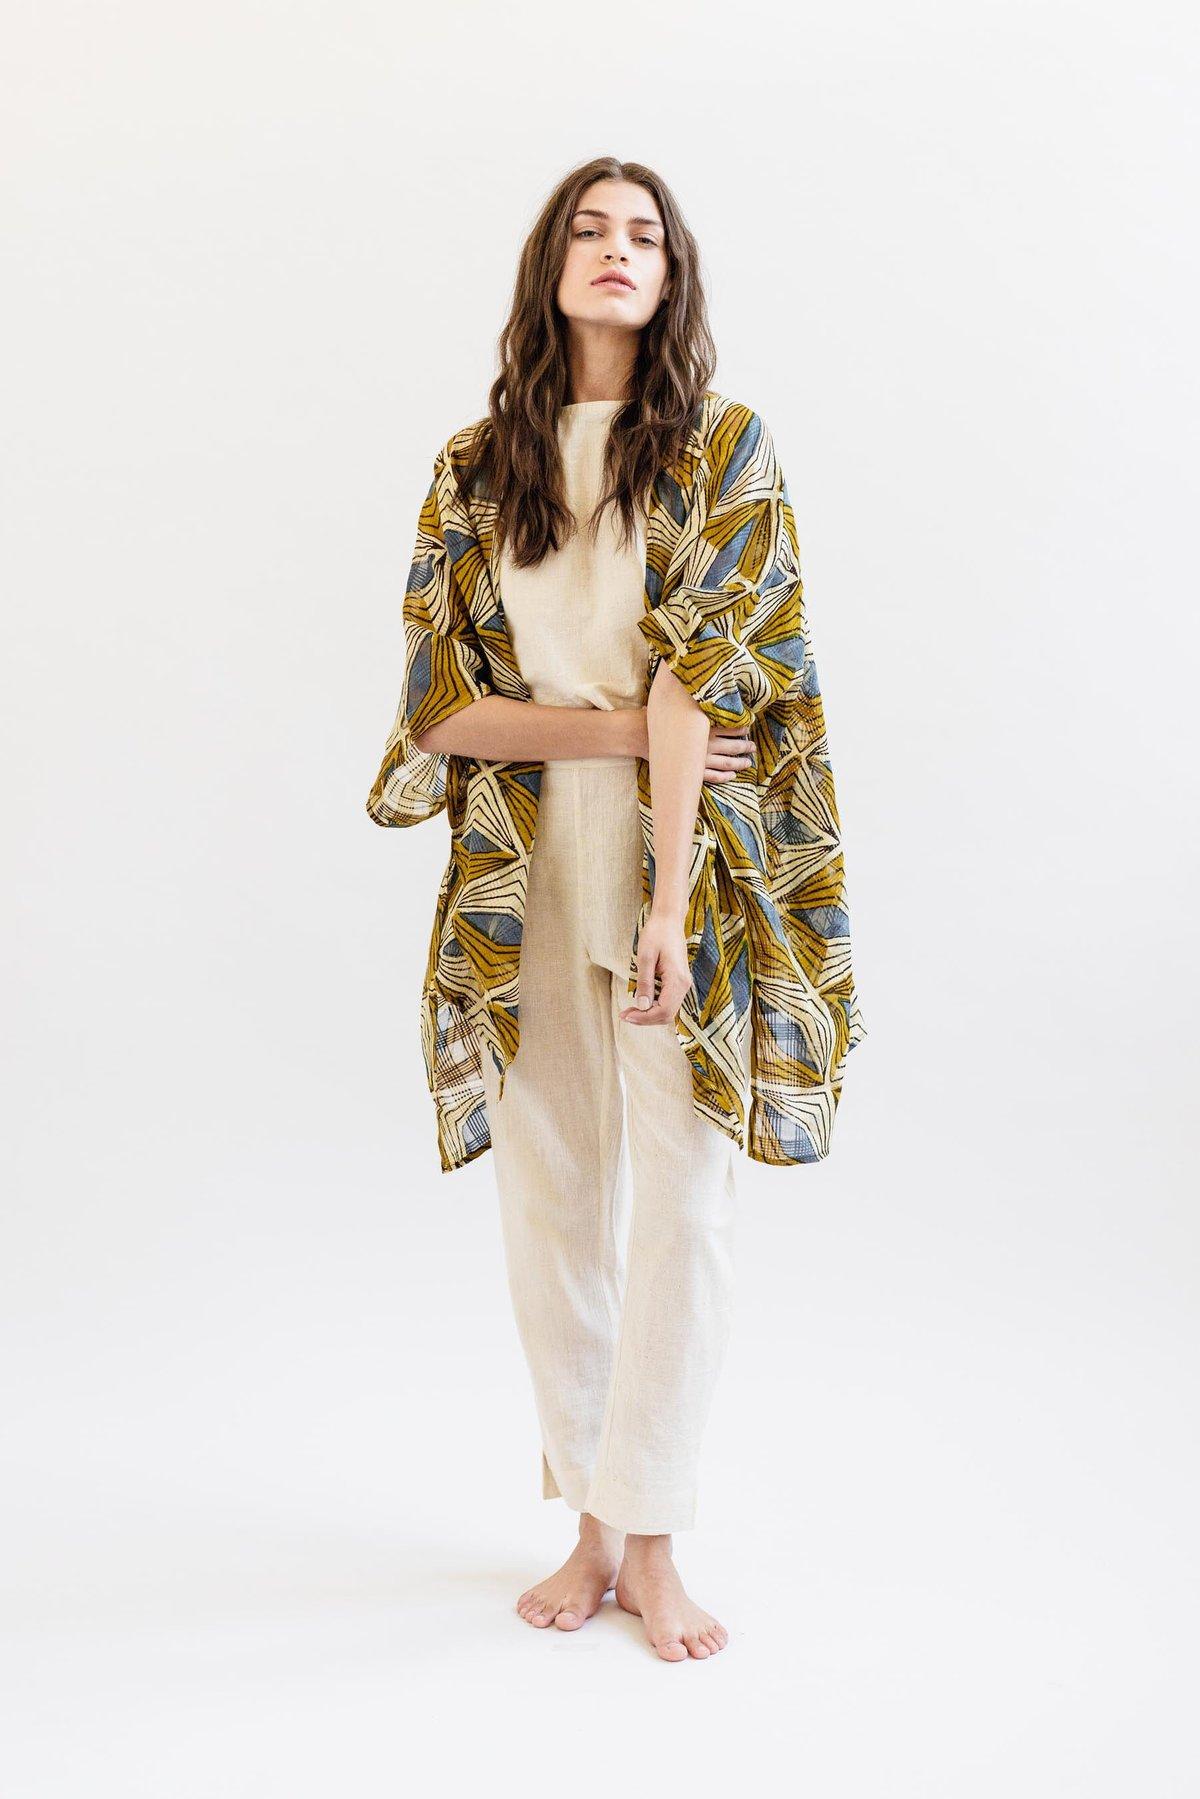 Image of Maelu Short Kimono - Hattie Print